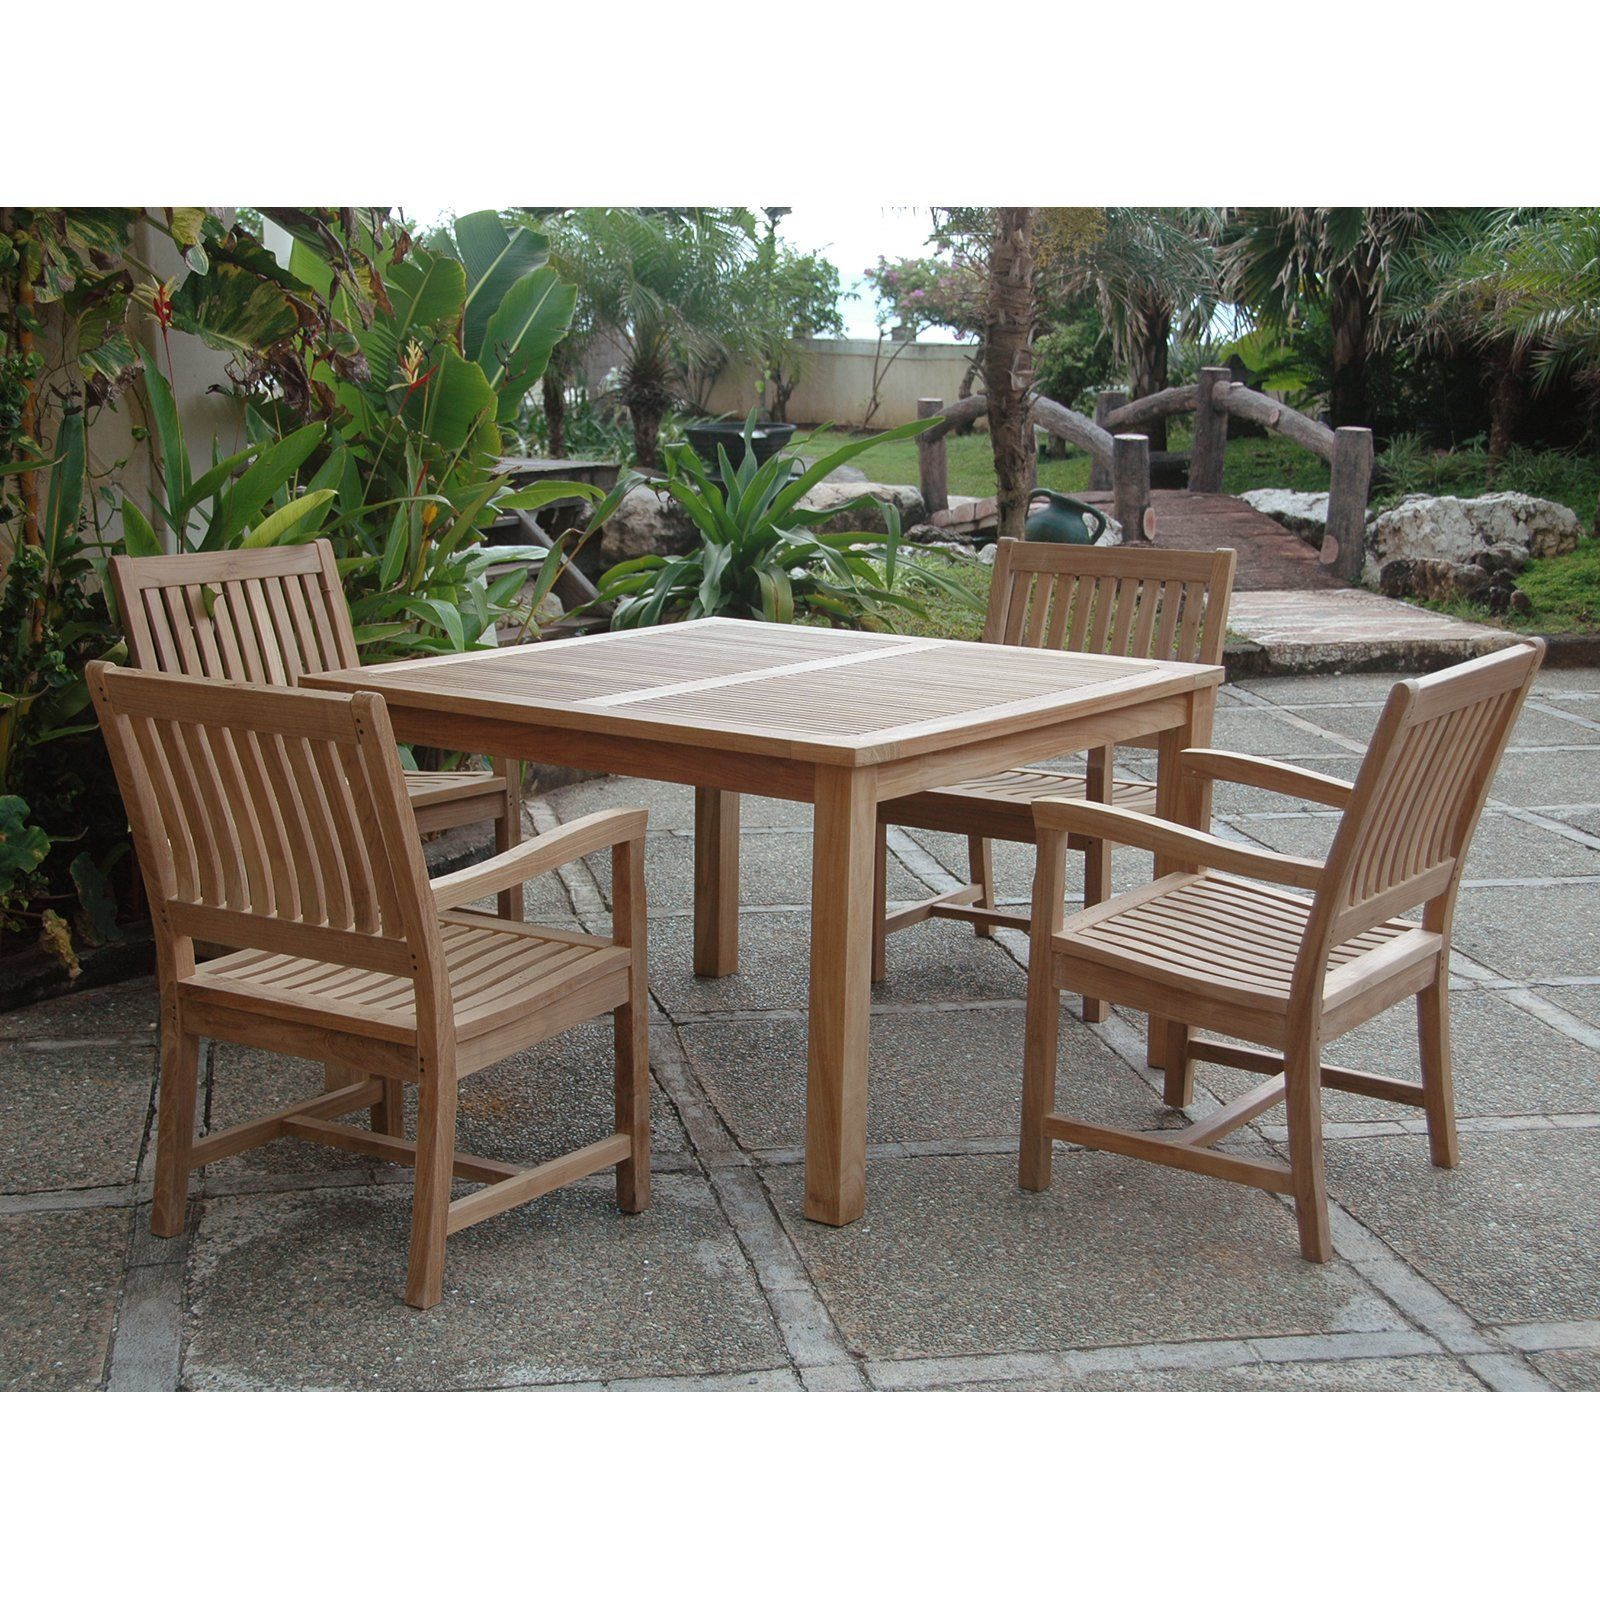 Outdoor Anderson Teak Rialto 4 Person Teak Patio Dining Set Canvas Pacific Blue Patio Dining Set